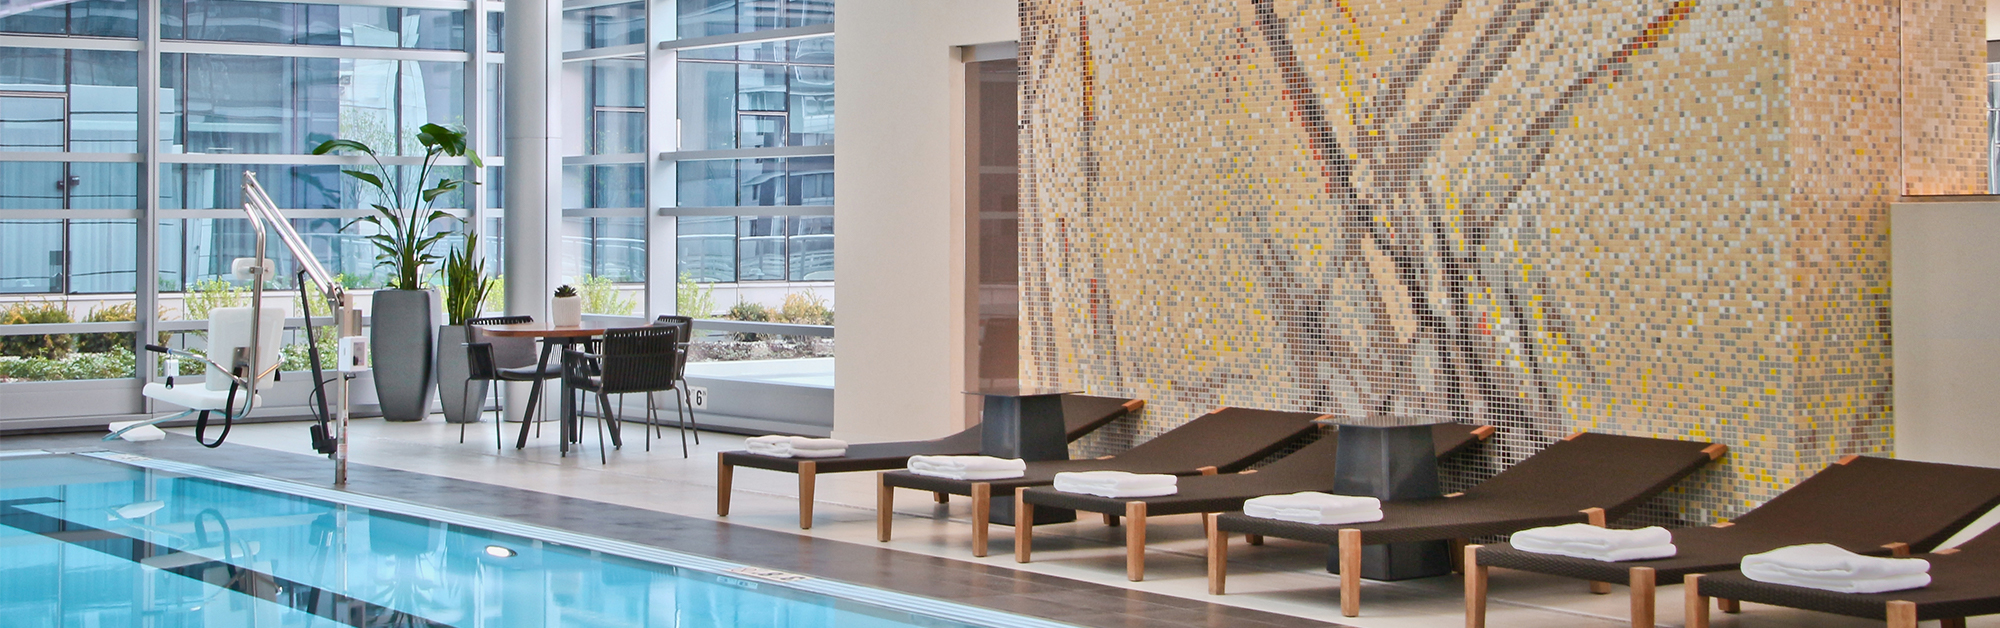 Custom Pool Tile Designs - Artaic